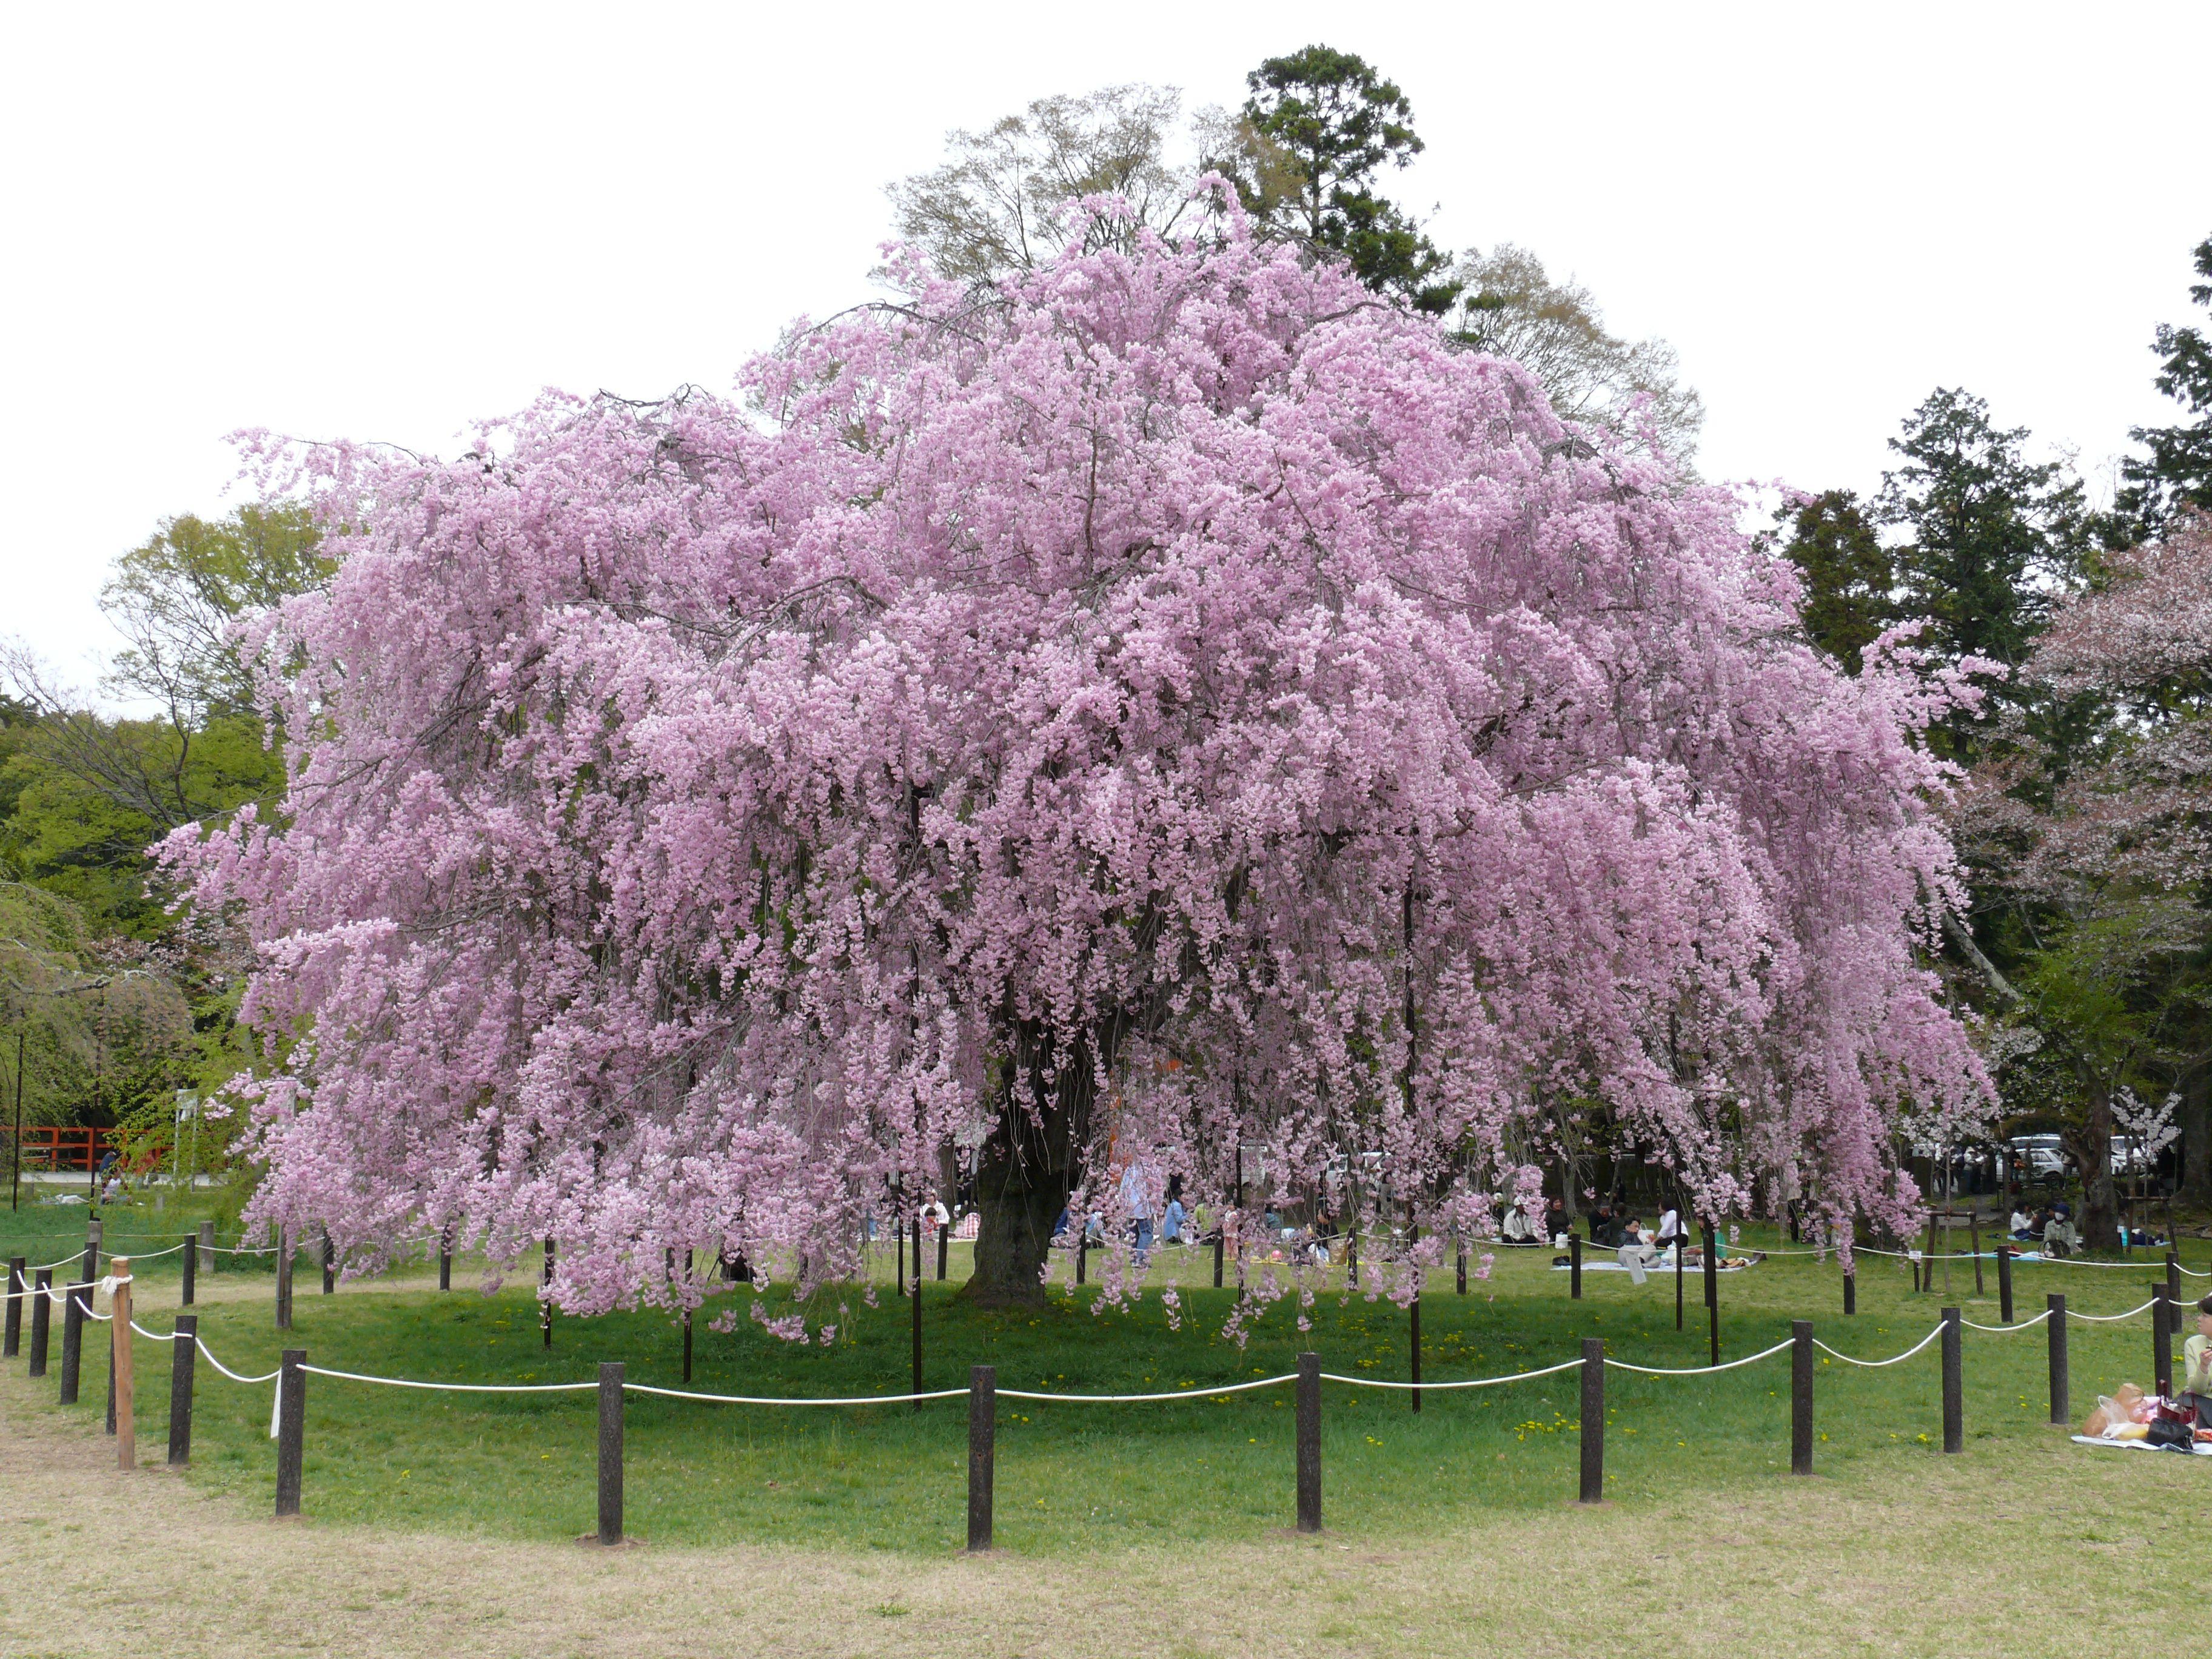 flowering ornamental weeping cherry tree trees. Black Bedroom Furniture Sets. Home Design Ideas